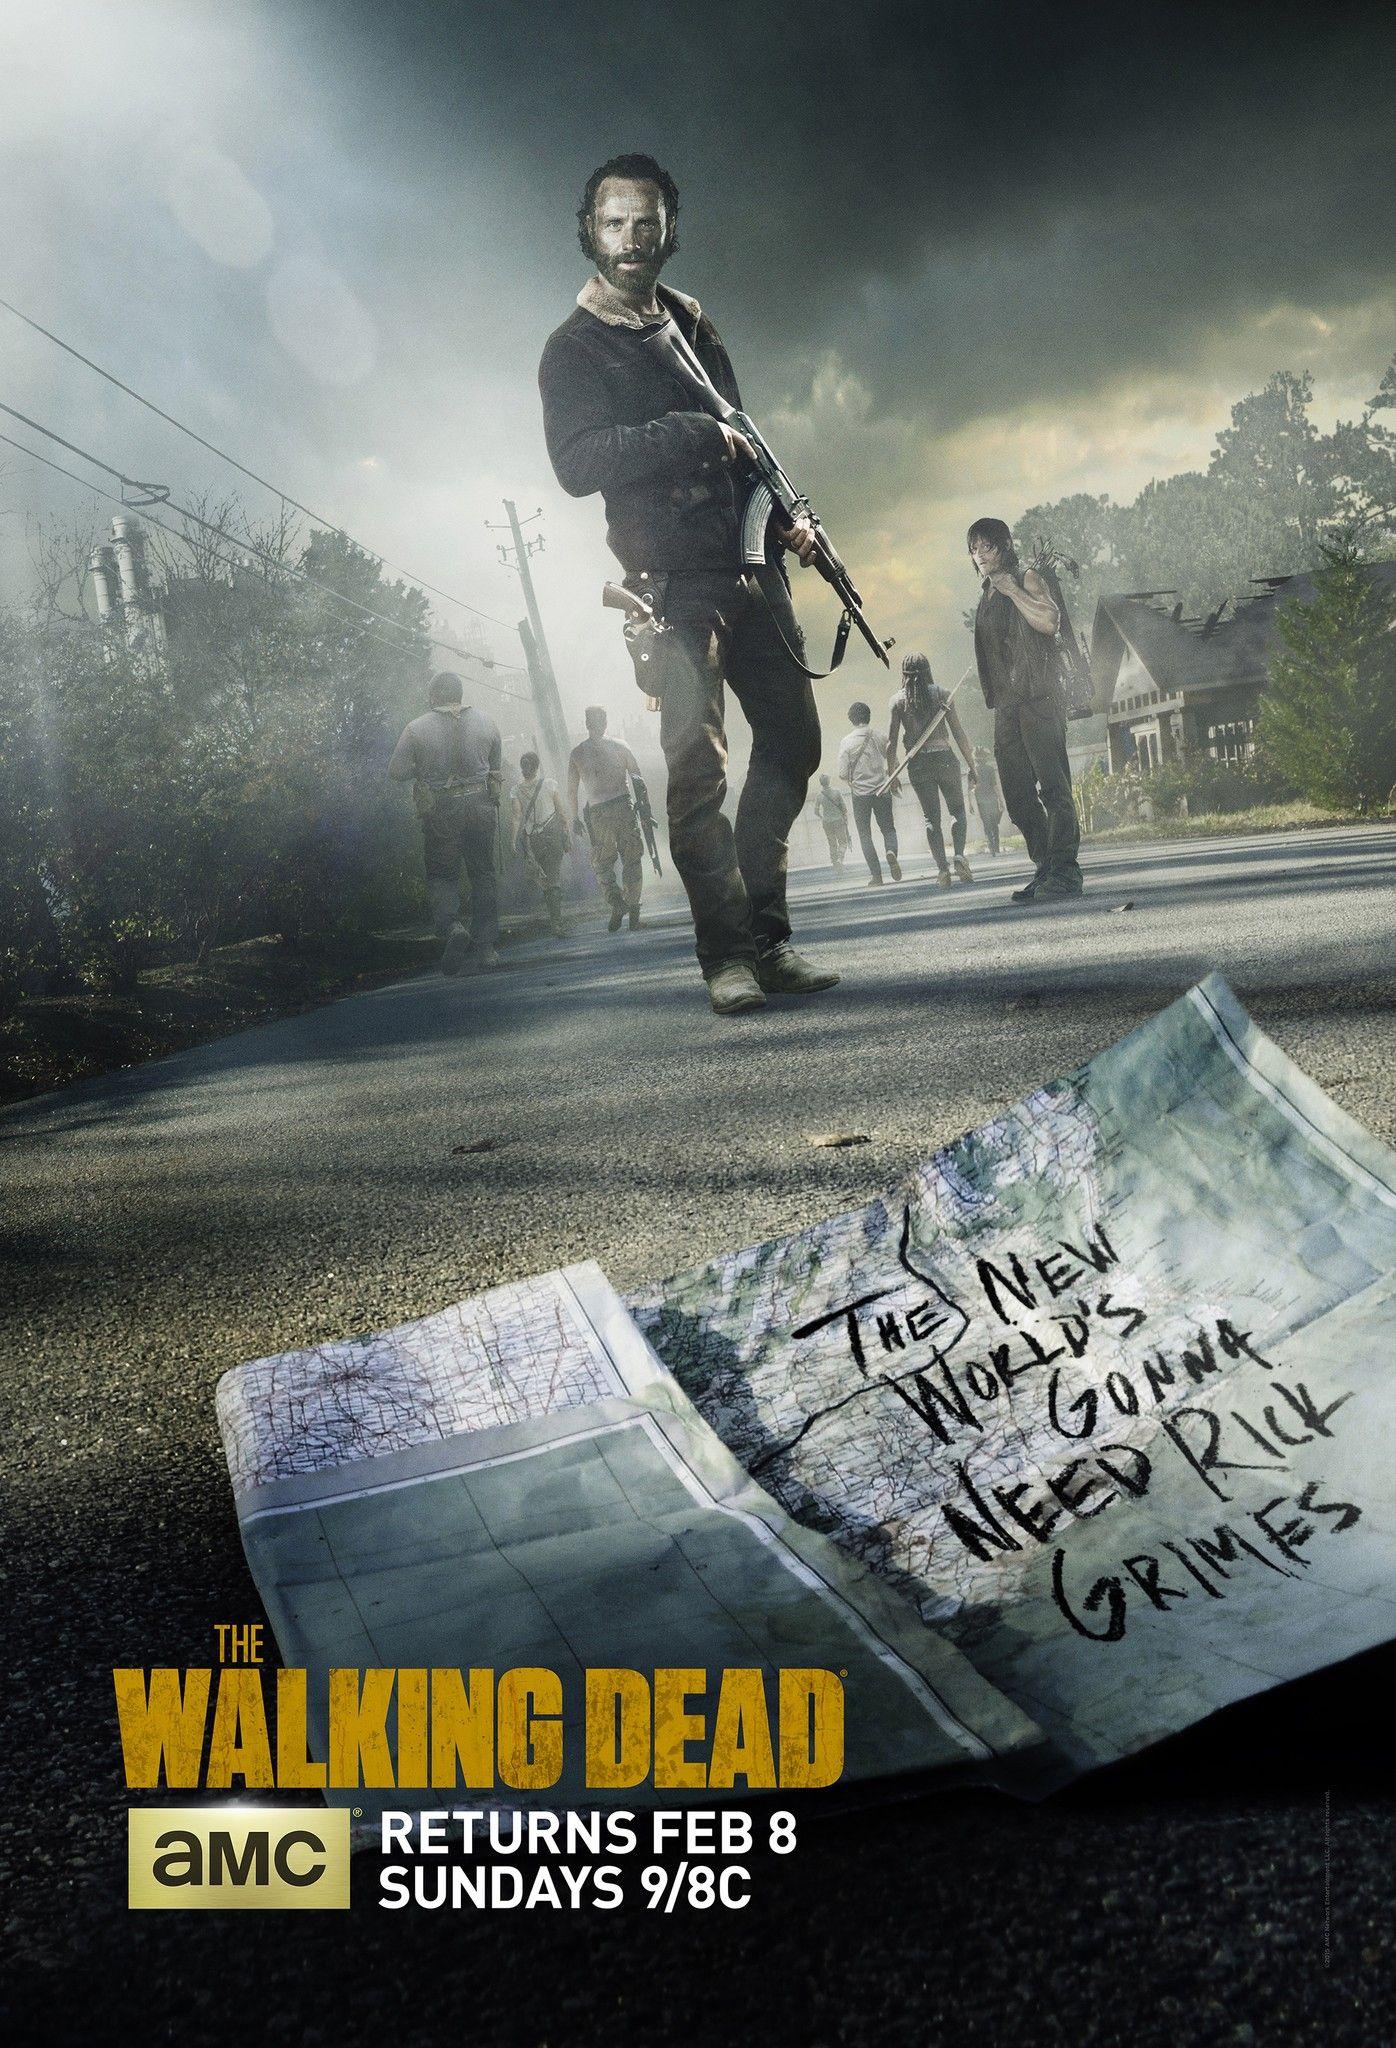 The Walking Dead Season 9 Rick Grimes Final Episodes Trailers Artwork The Walking Dead Poster Walking Dead Tv Series Walking Dead Season